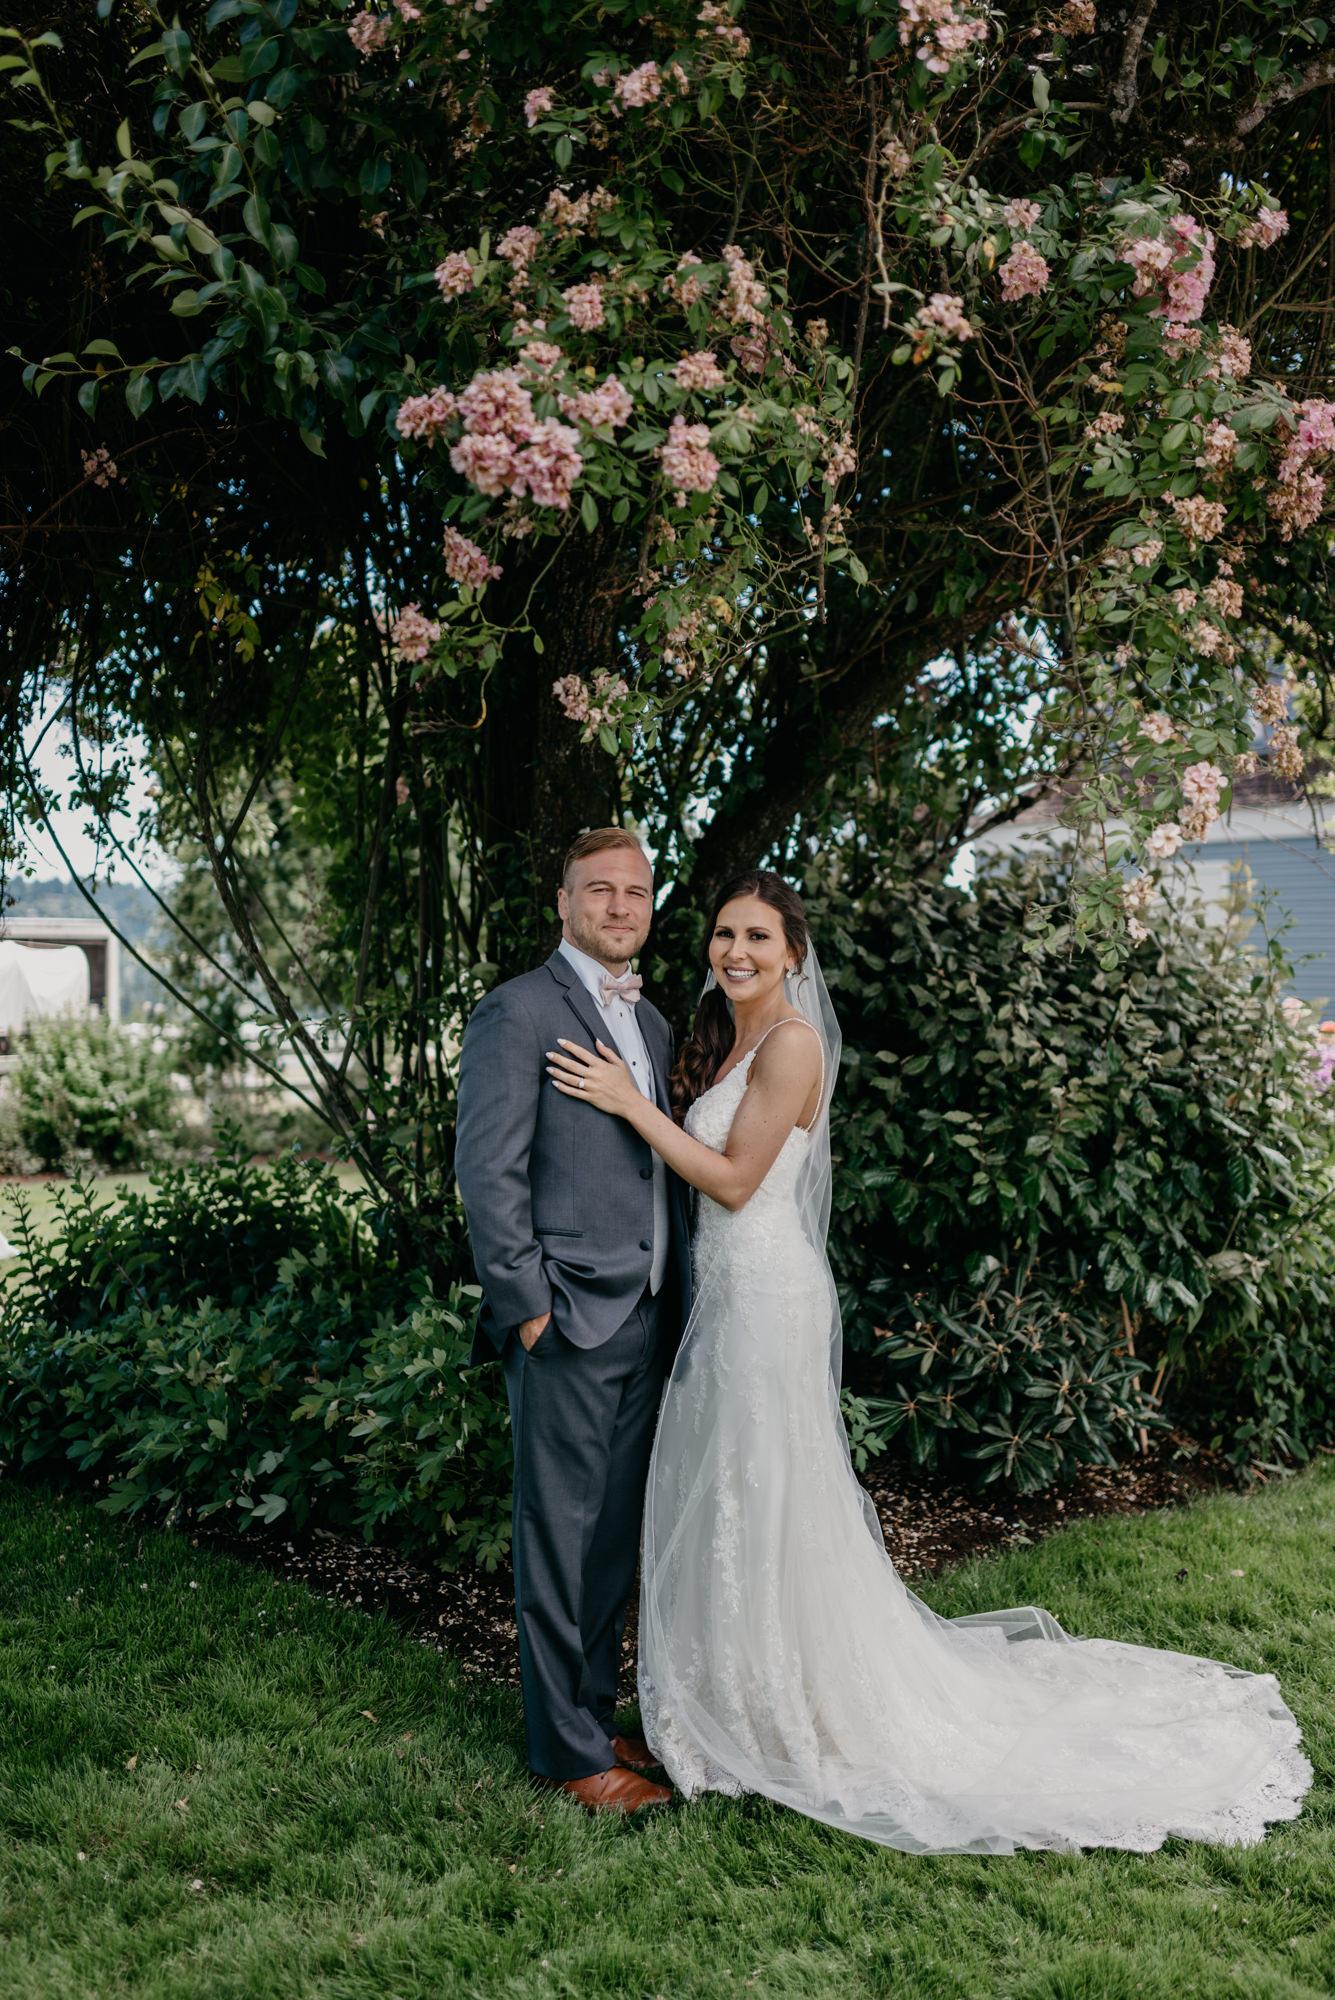 76-lake-oswego-wedding-portland-couple-rose-tree.jpg